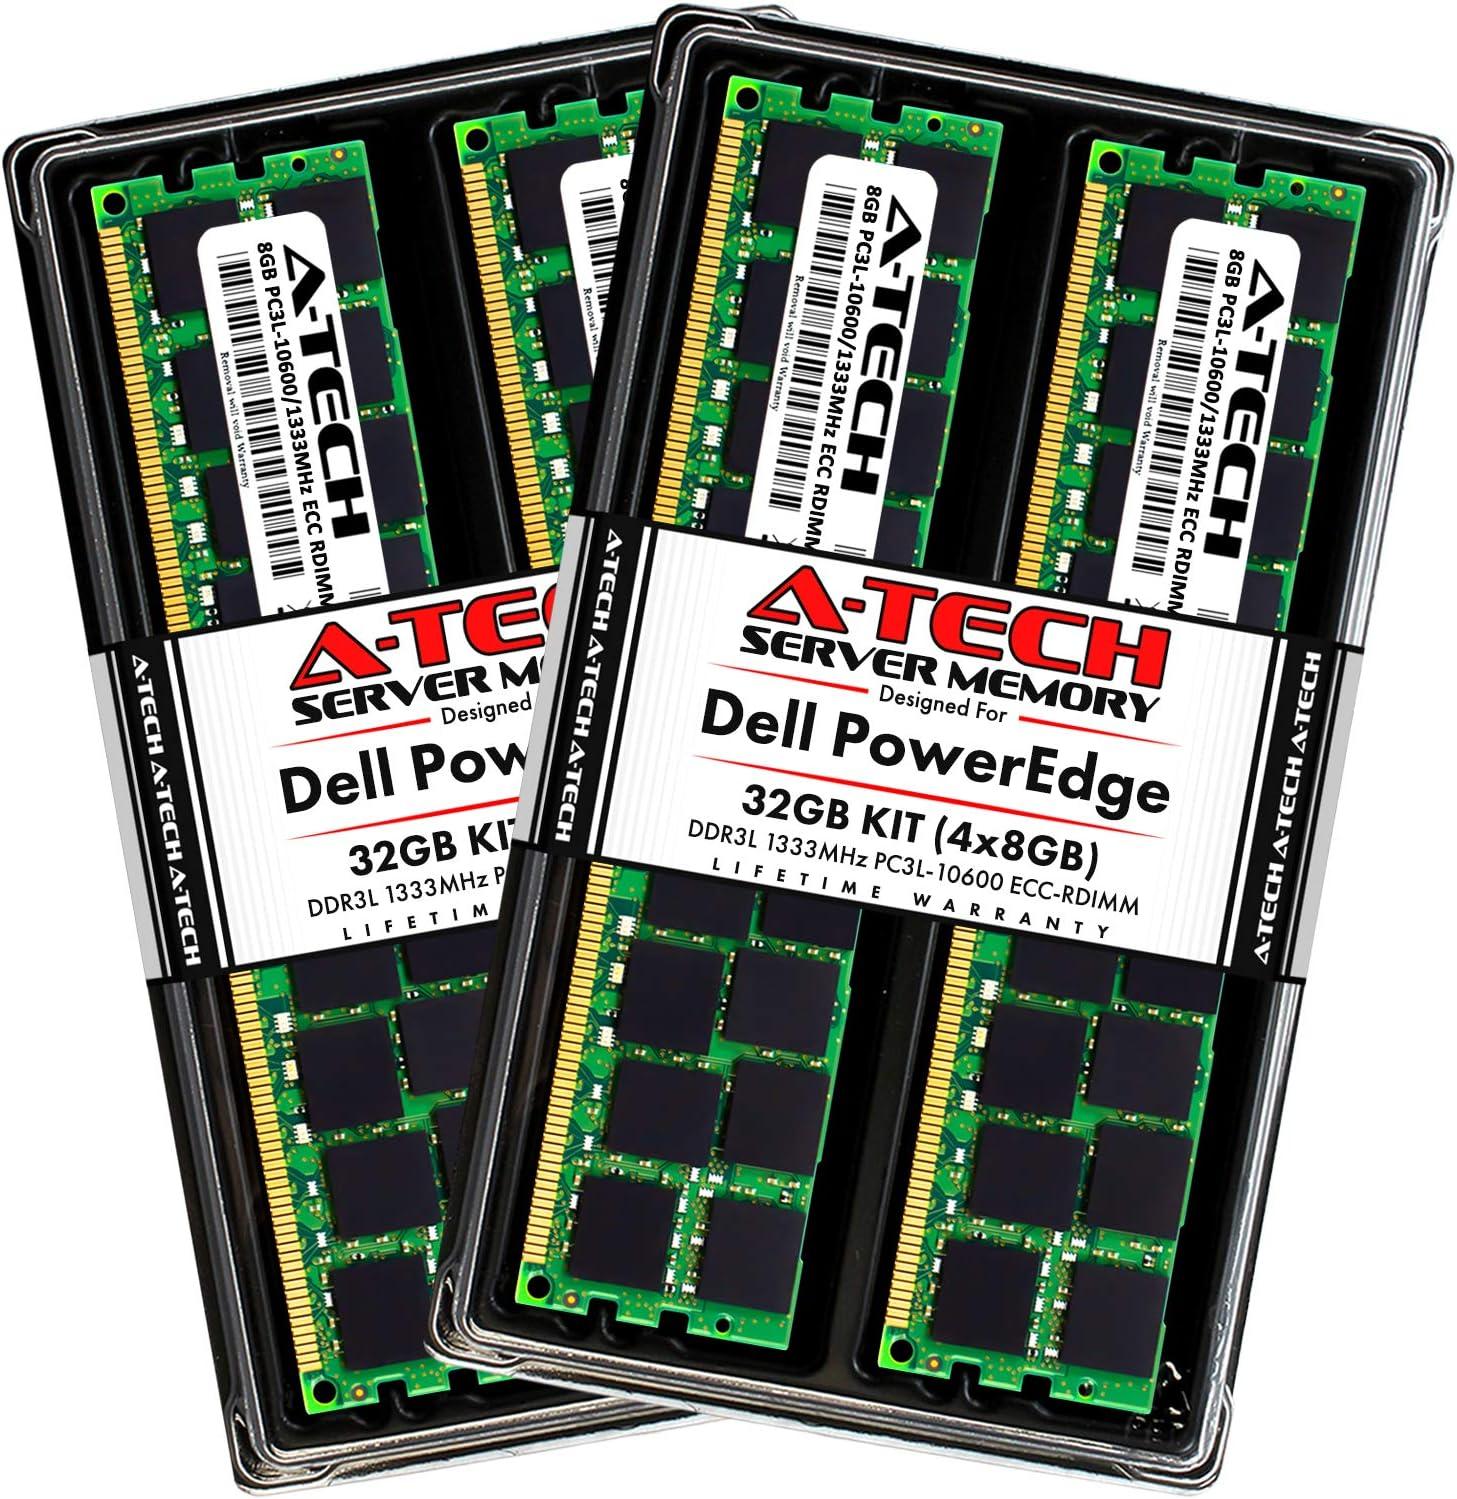 A-Tech 32GB (4x8GB) RAM for Dell PowerEdge M610, M710, M710HD, M915 Servers | DDR3 1333MHz ECC-RDIMM PC3L-10600 2Rx4 1.35V 240-Pin ECC Registered DIMM Server Memory Upgrade Kit